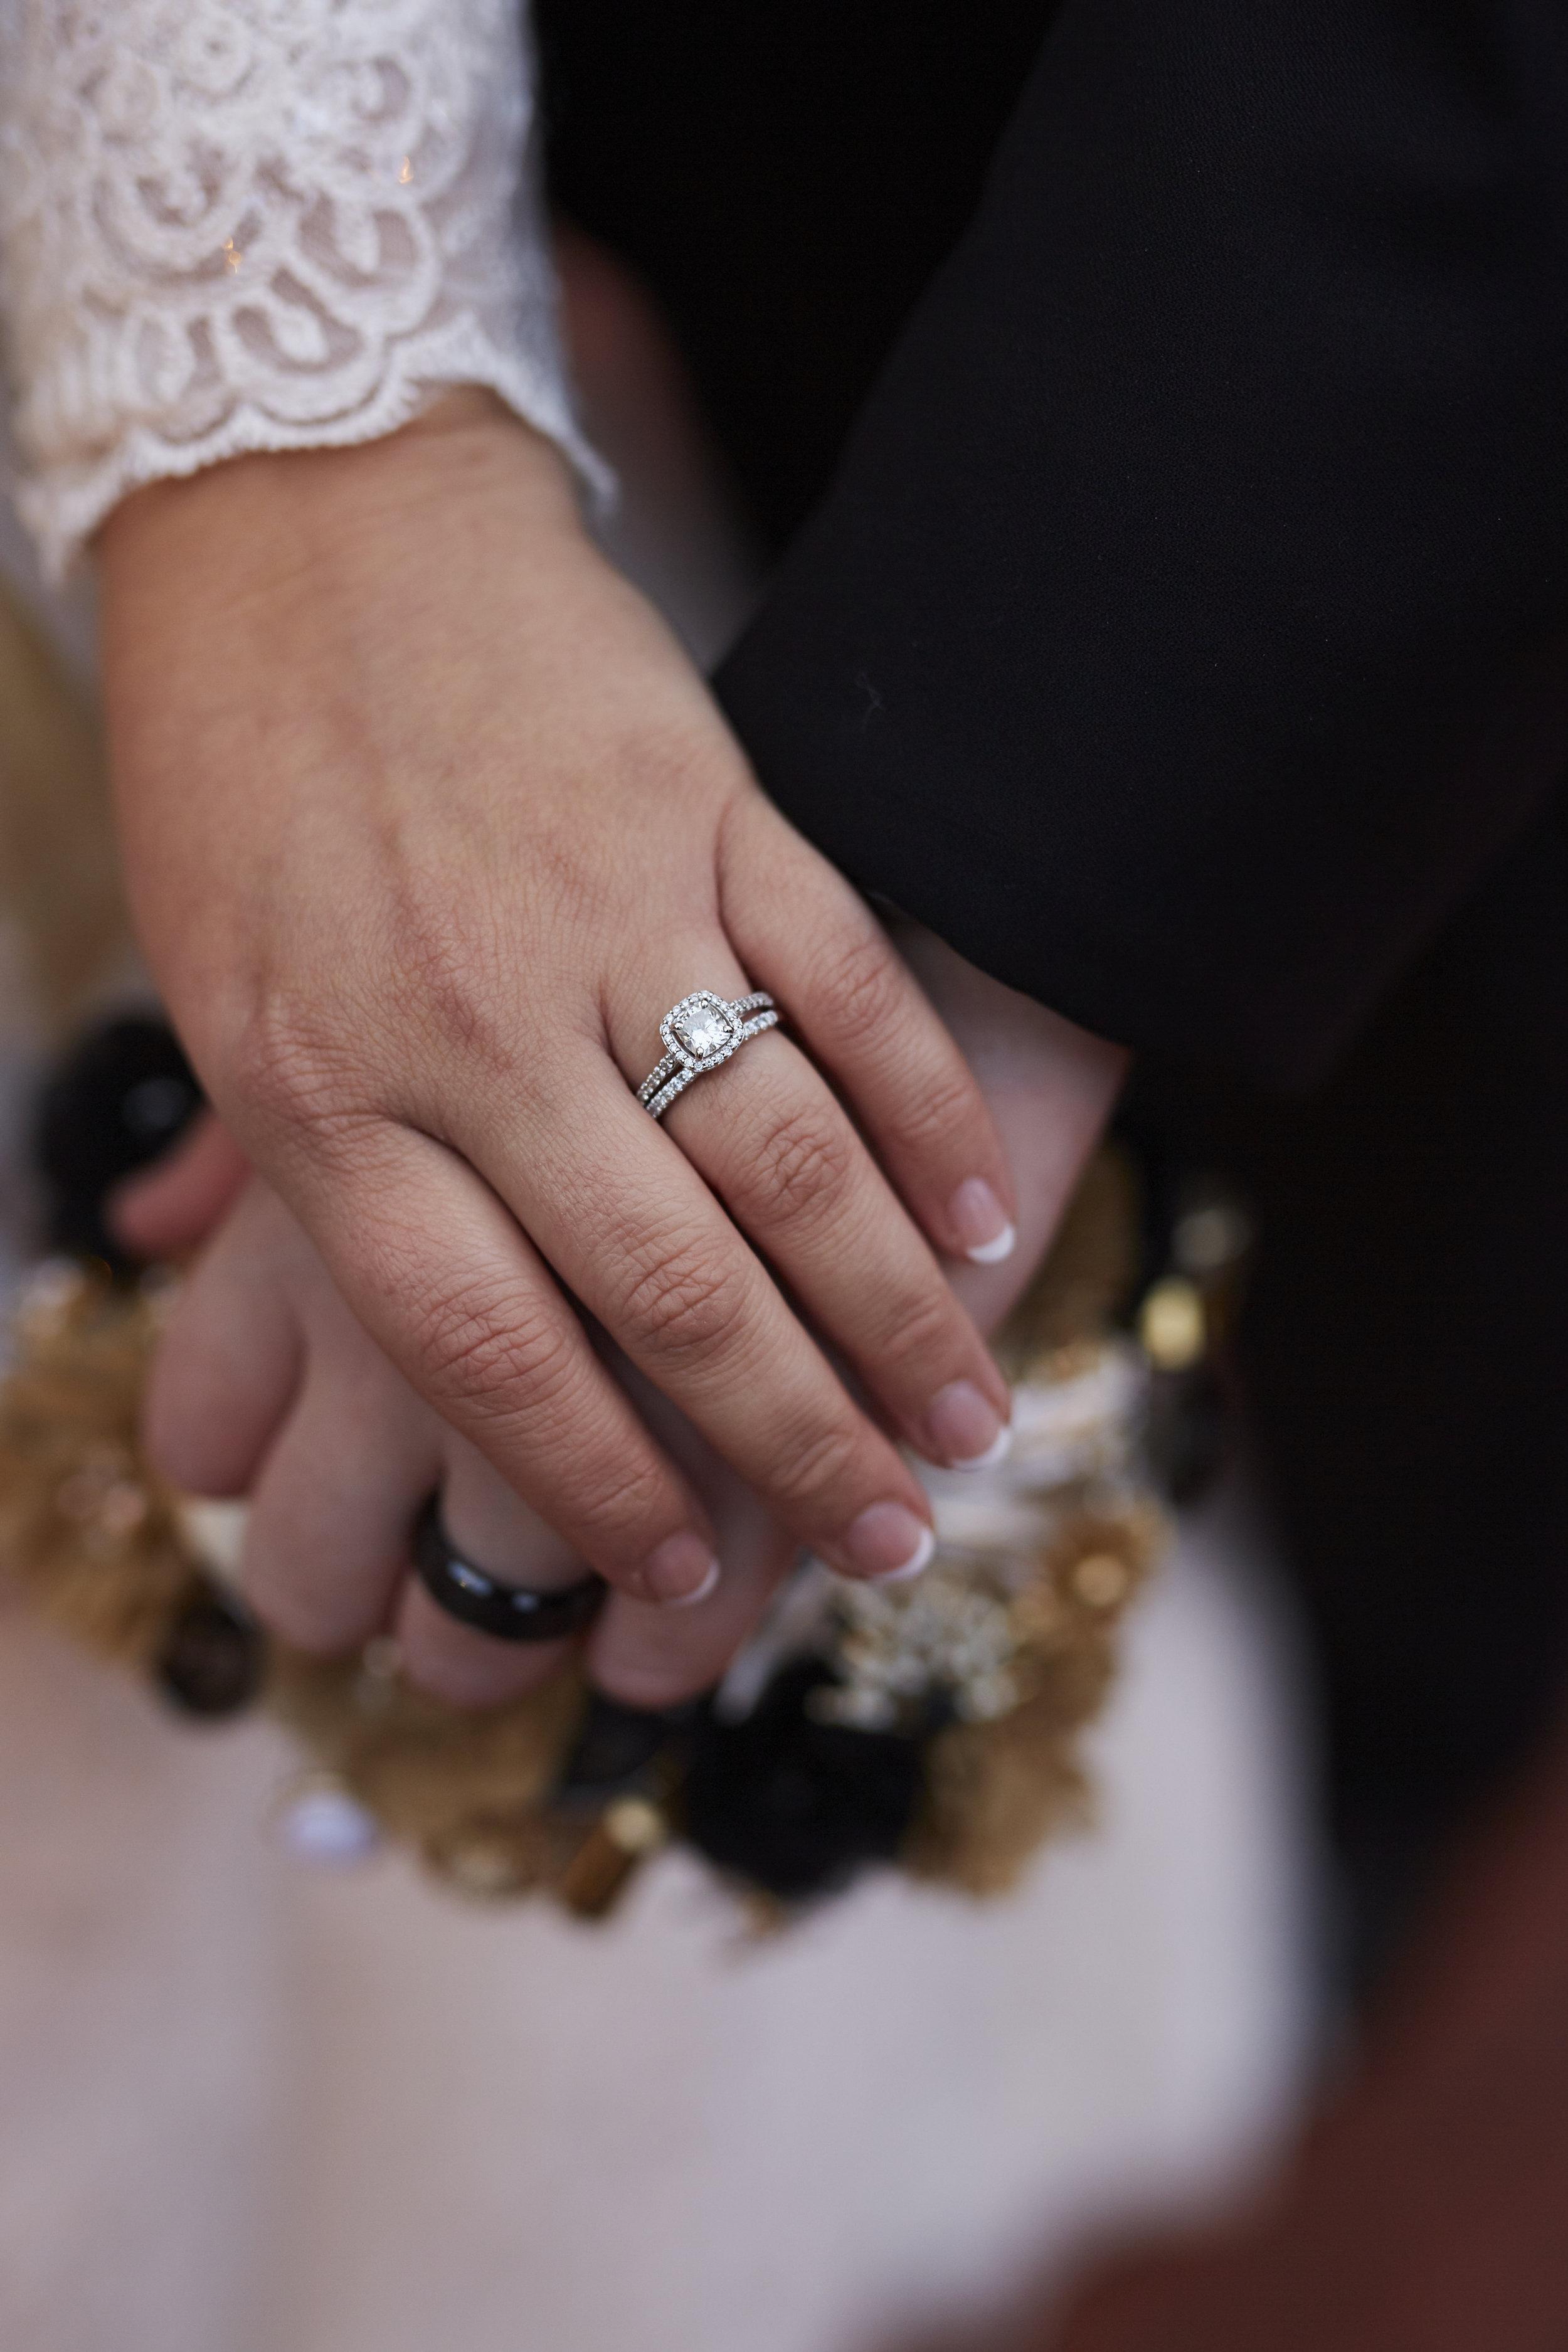 Liz & Josh Wedding -  benromangphoto - 6I5A0800.jpg